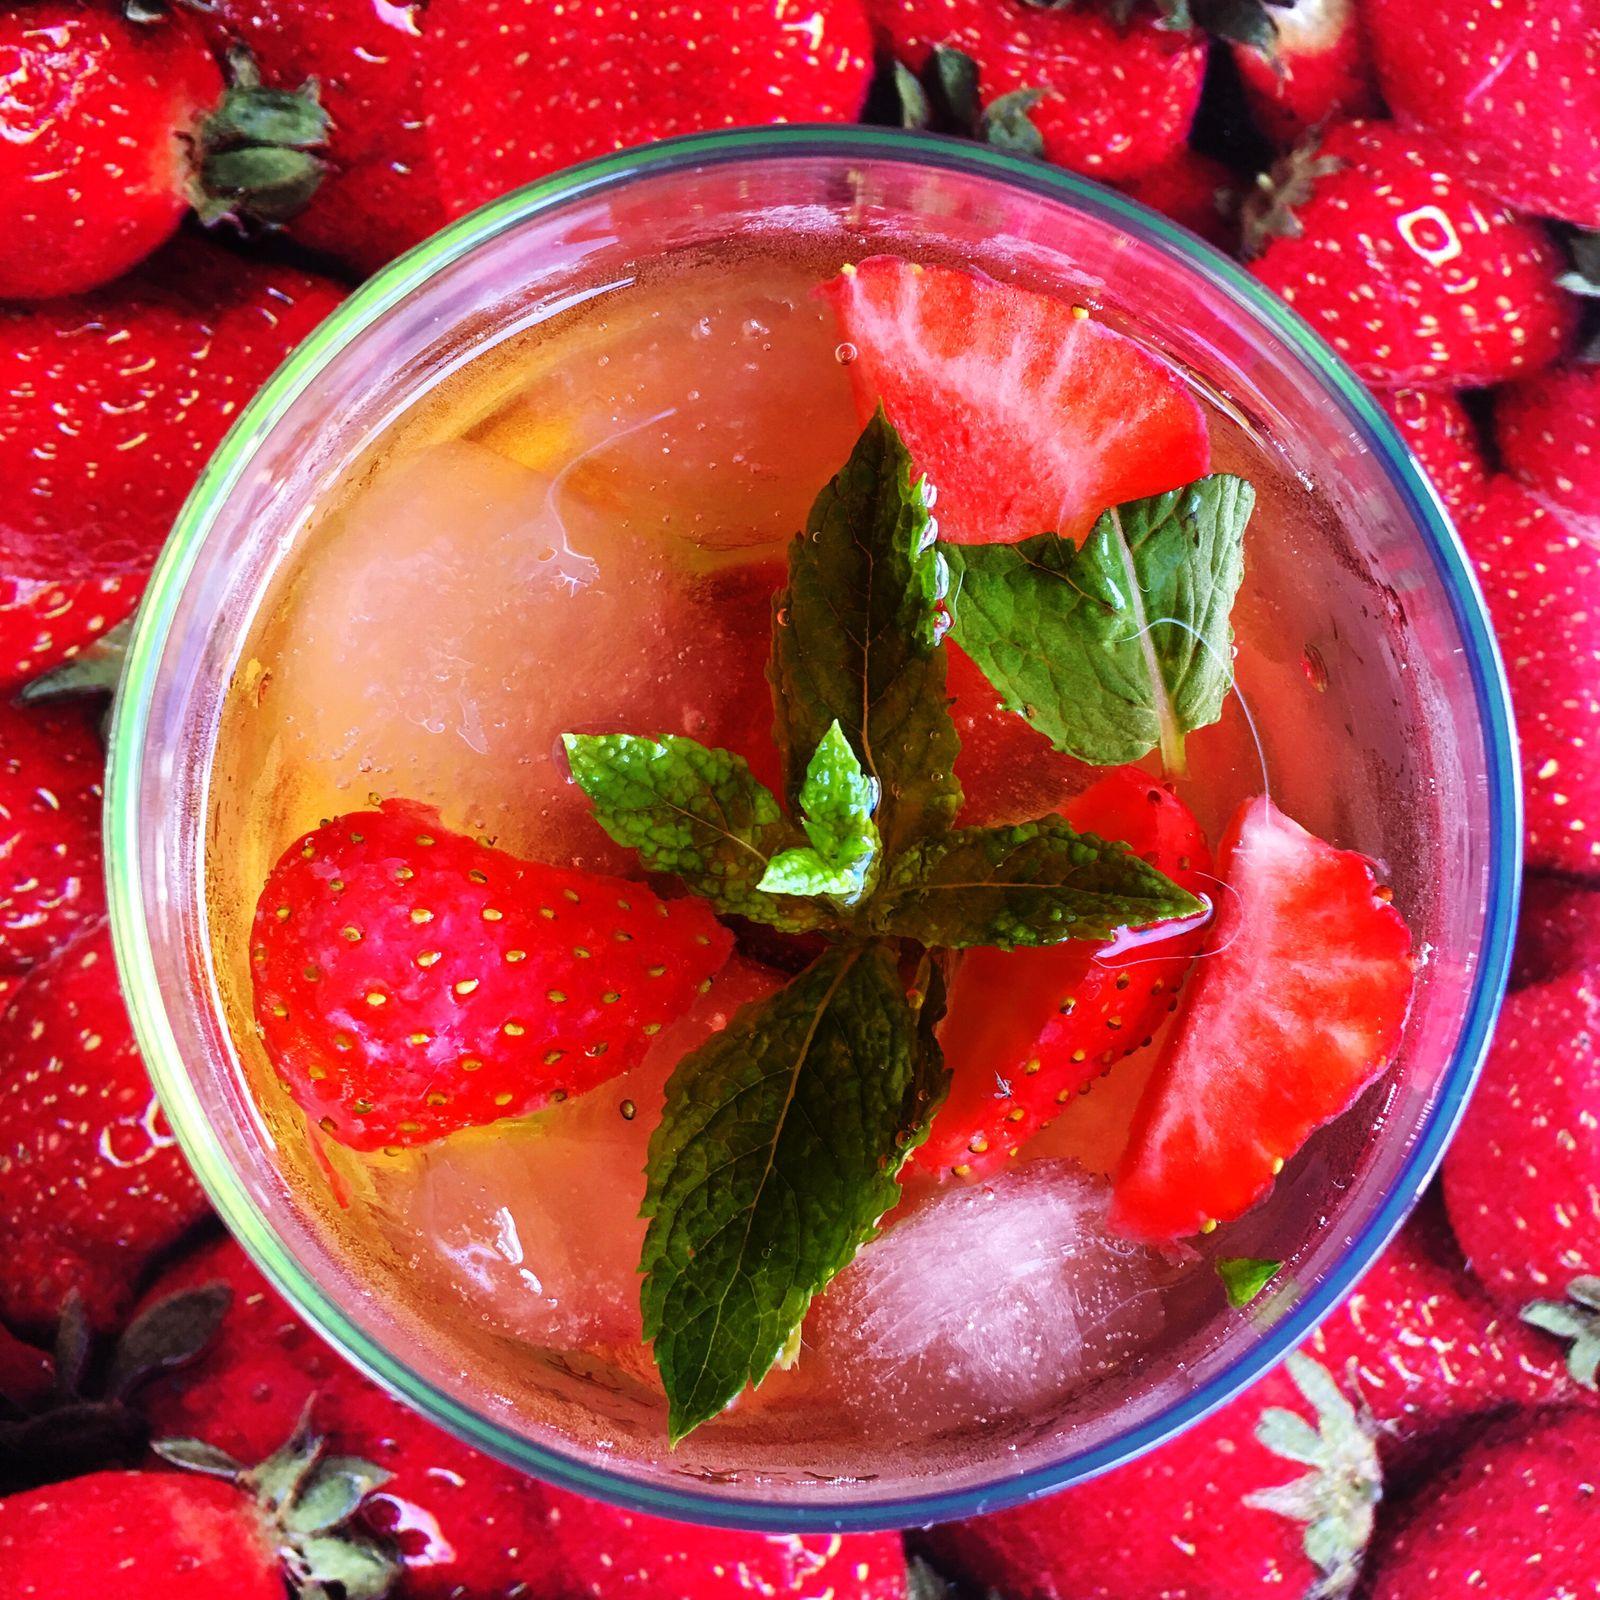 Frosé Drinks Rosé With My Bestie <3 Strawberrys Mint Leaves Happy Time